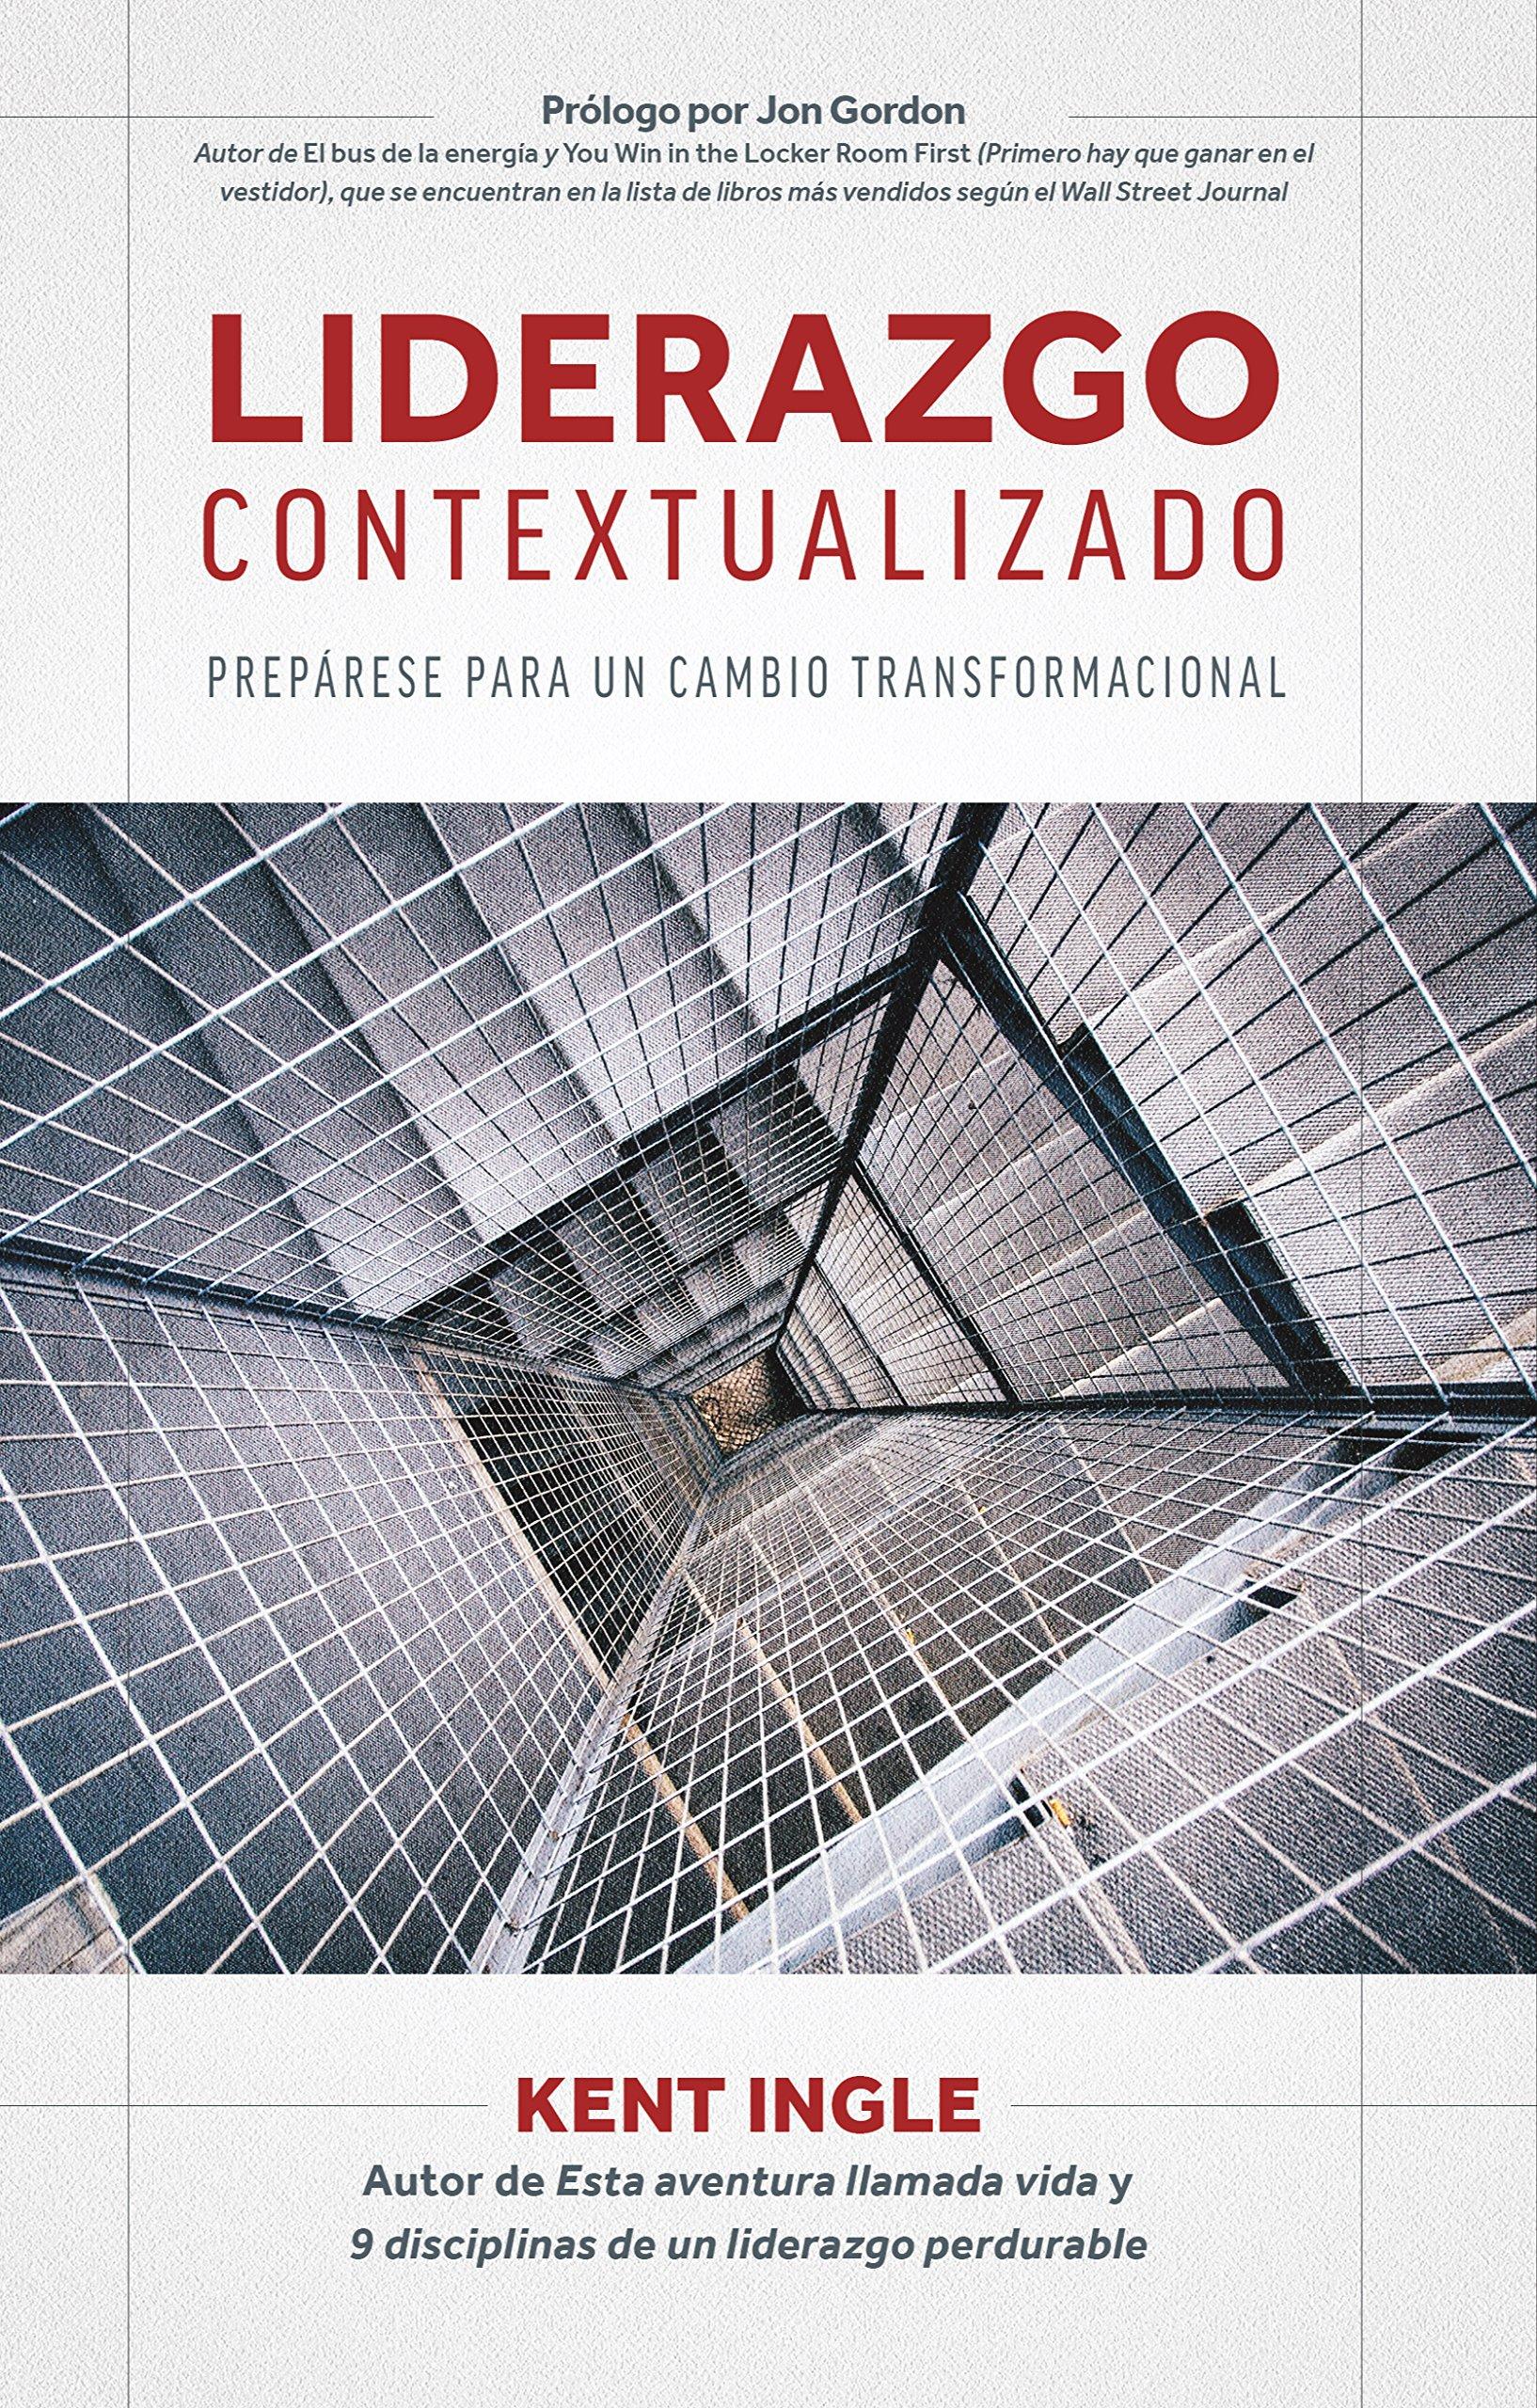 Liderazgo contextualizado (Spanish Edition) ebook